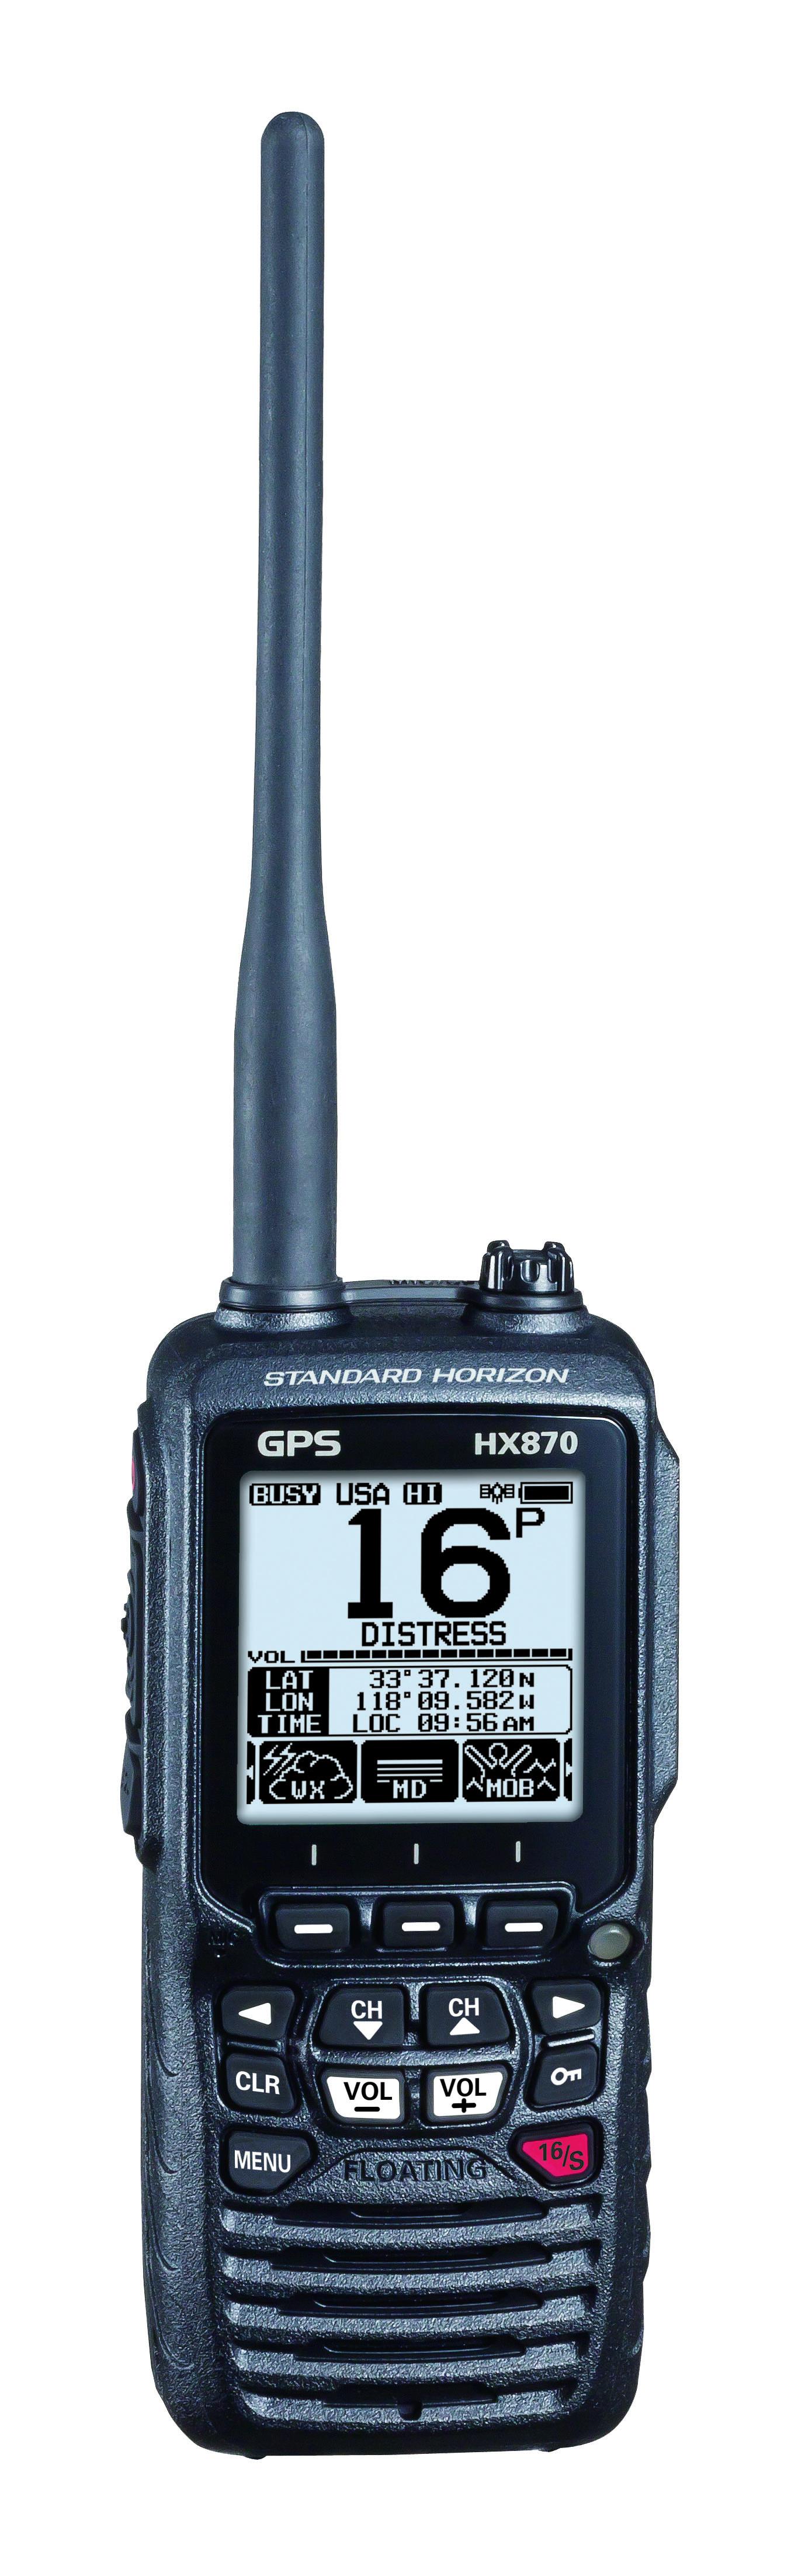 Standard Horizon HX870E Handfunkgerät mit integriertem GPS Front